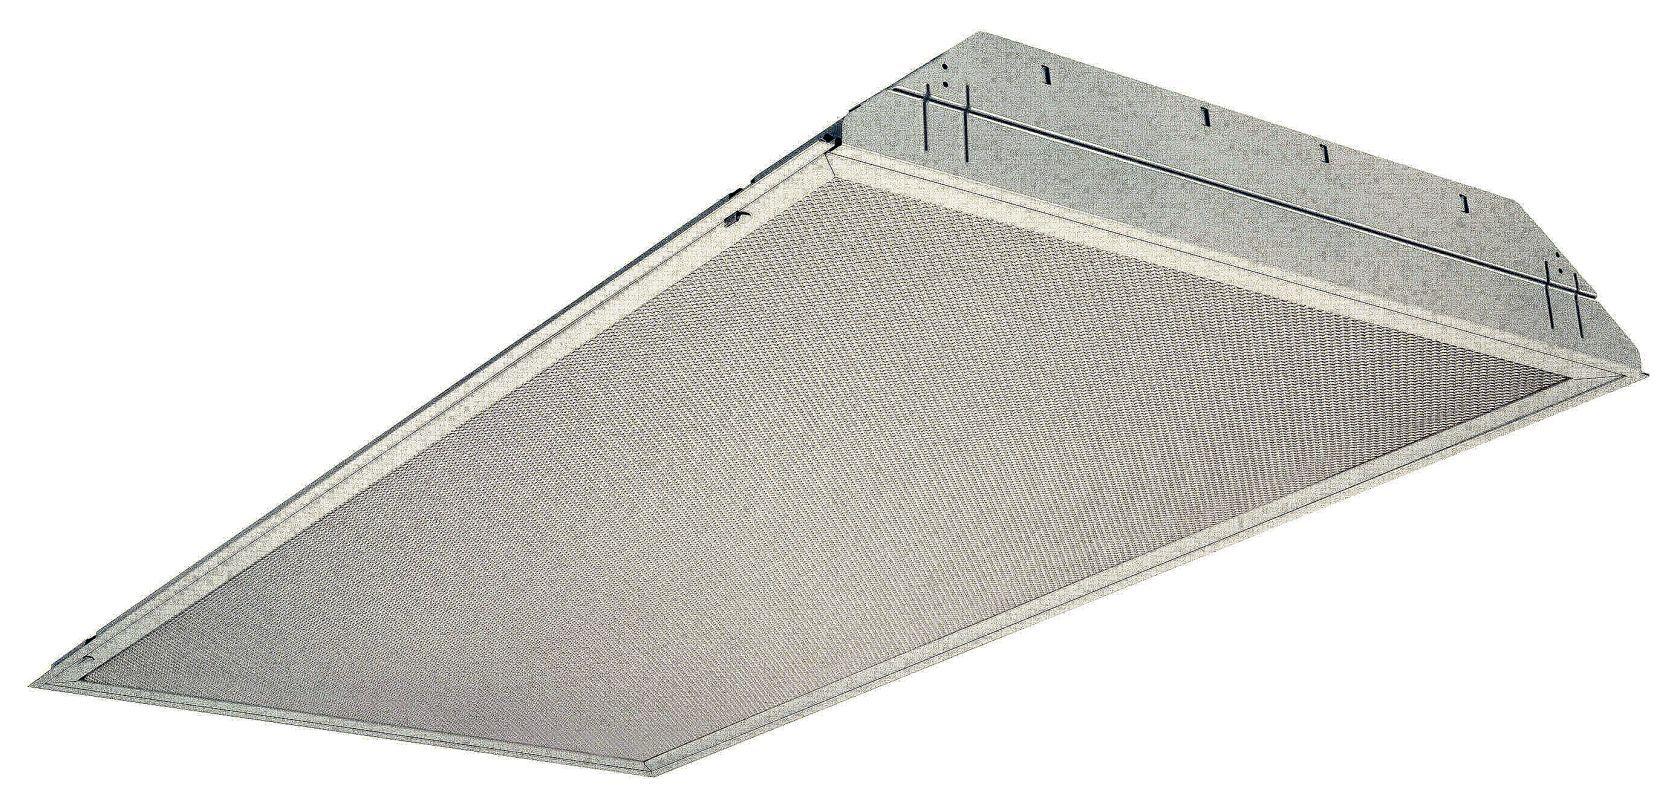 Lithonia Lighting 2gt8 4 32 A12 Mvolt 1